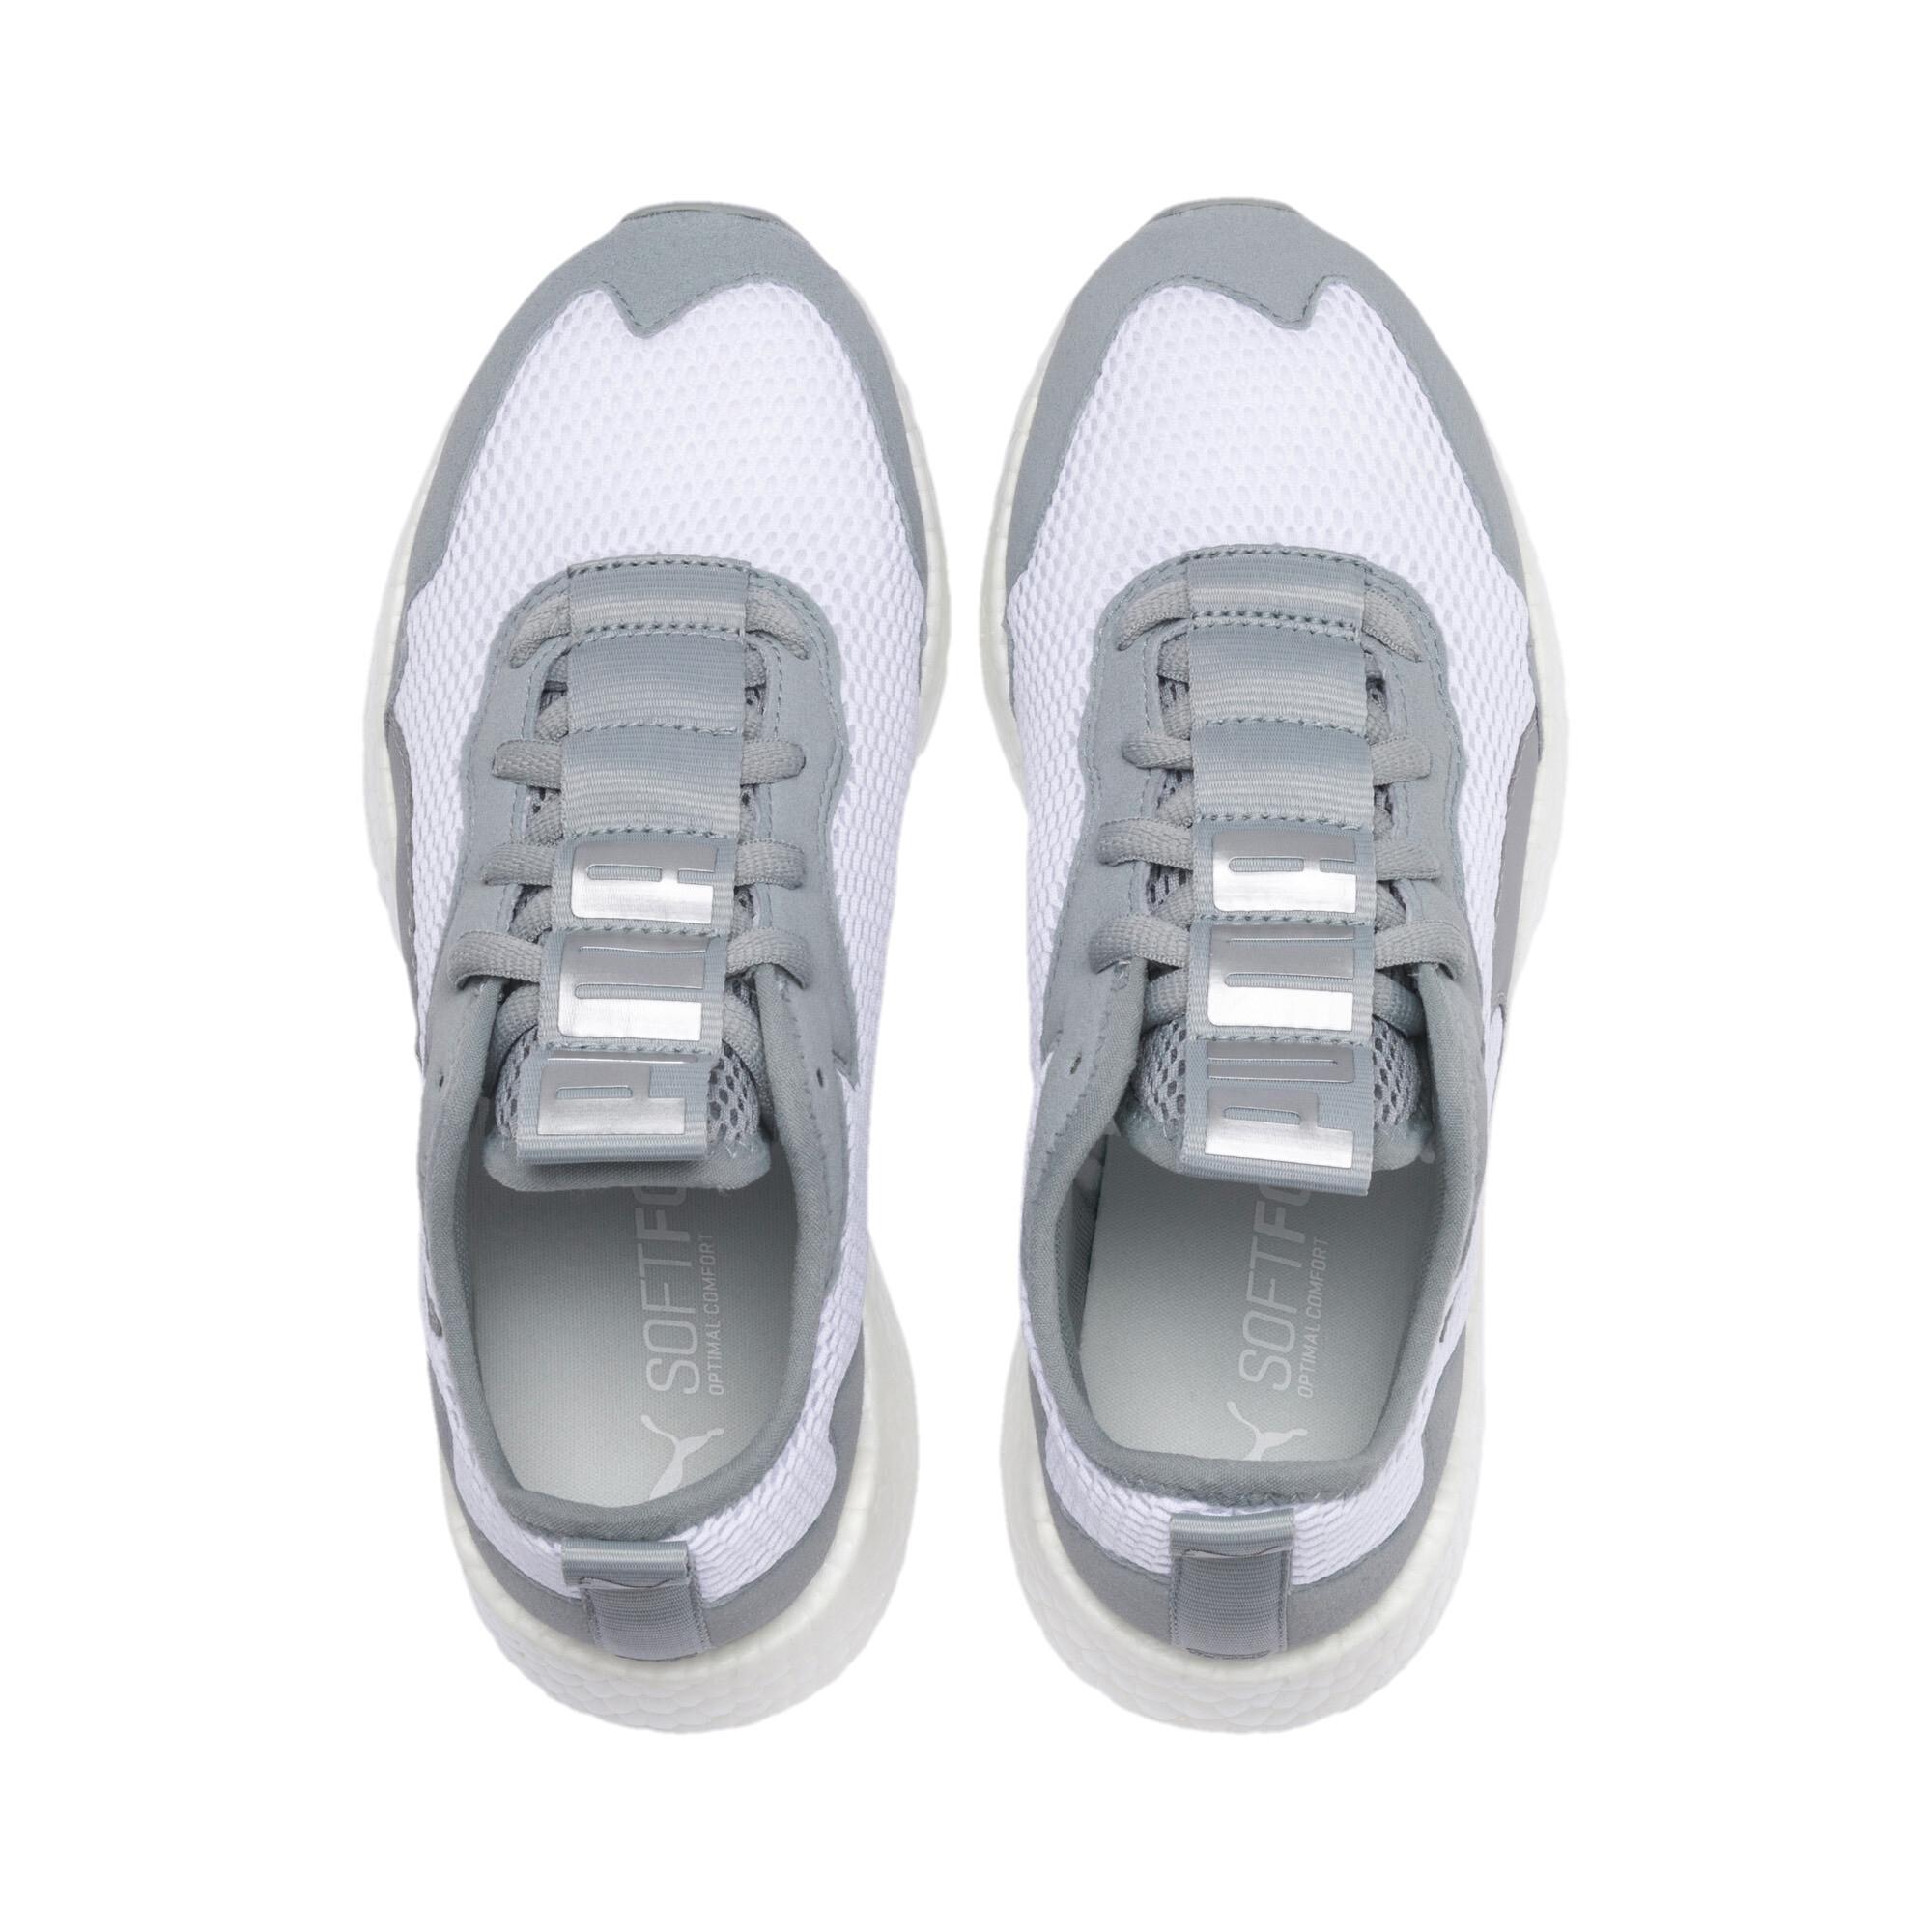 PUMA-Women-039-s-NRGY-Neko-Skim-Running-Shoes thumbnail 8